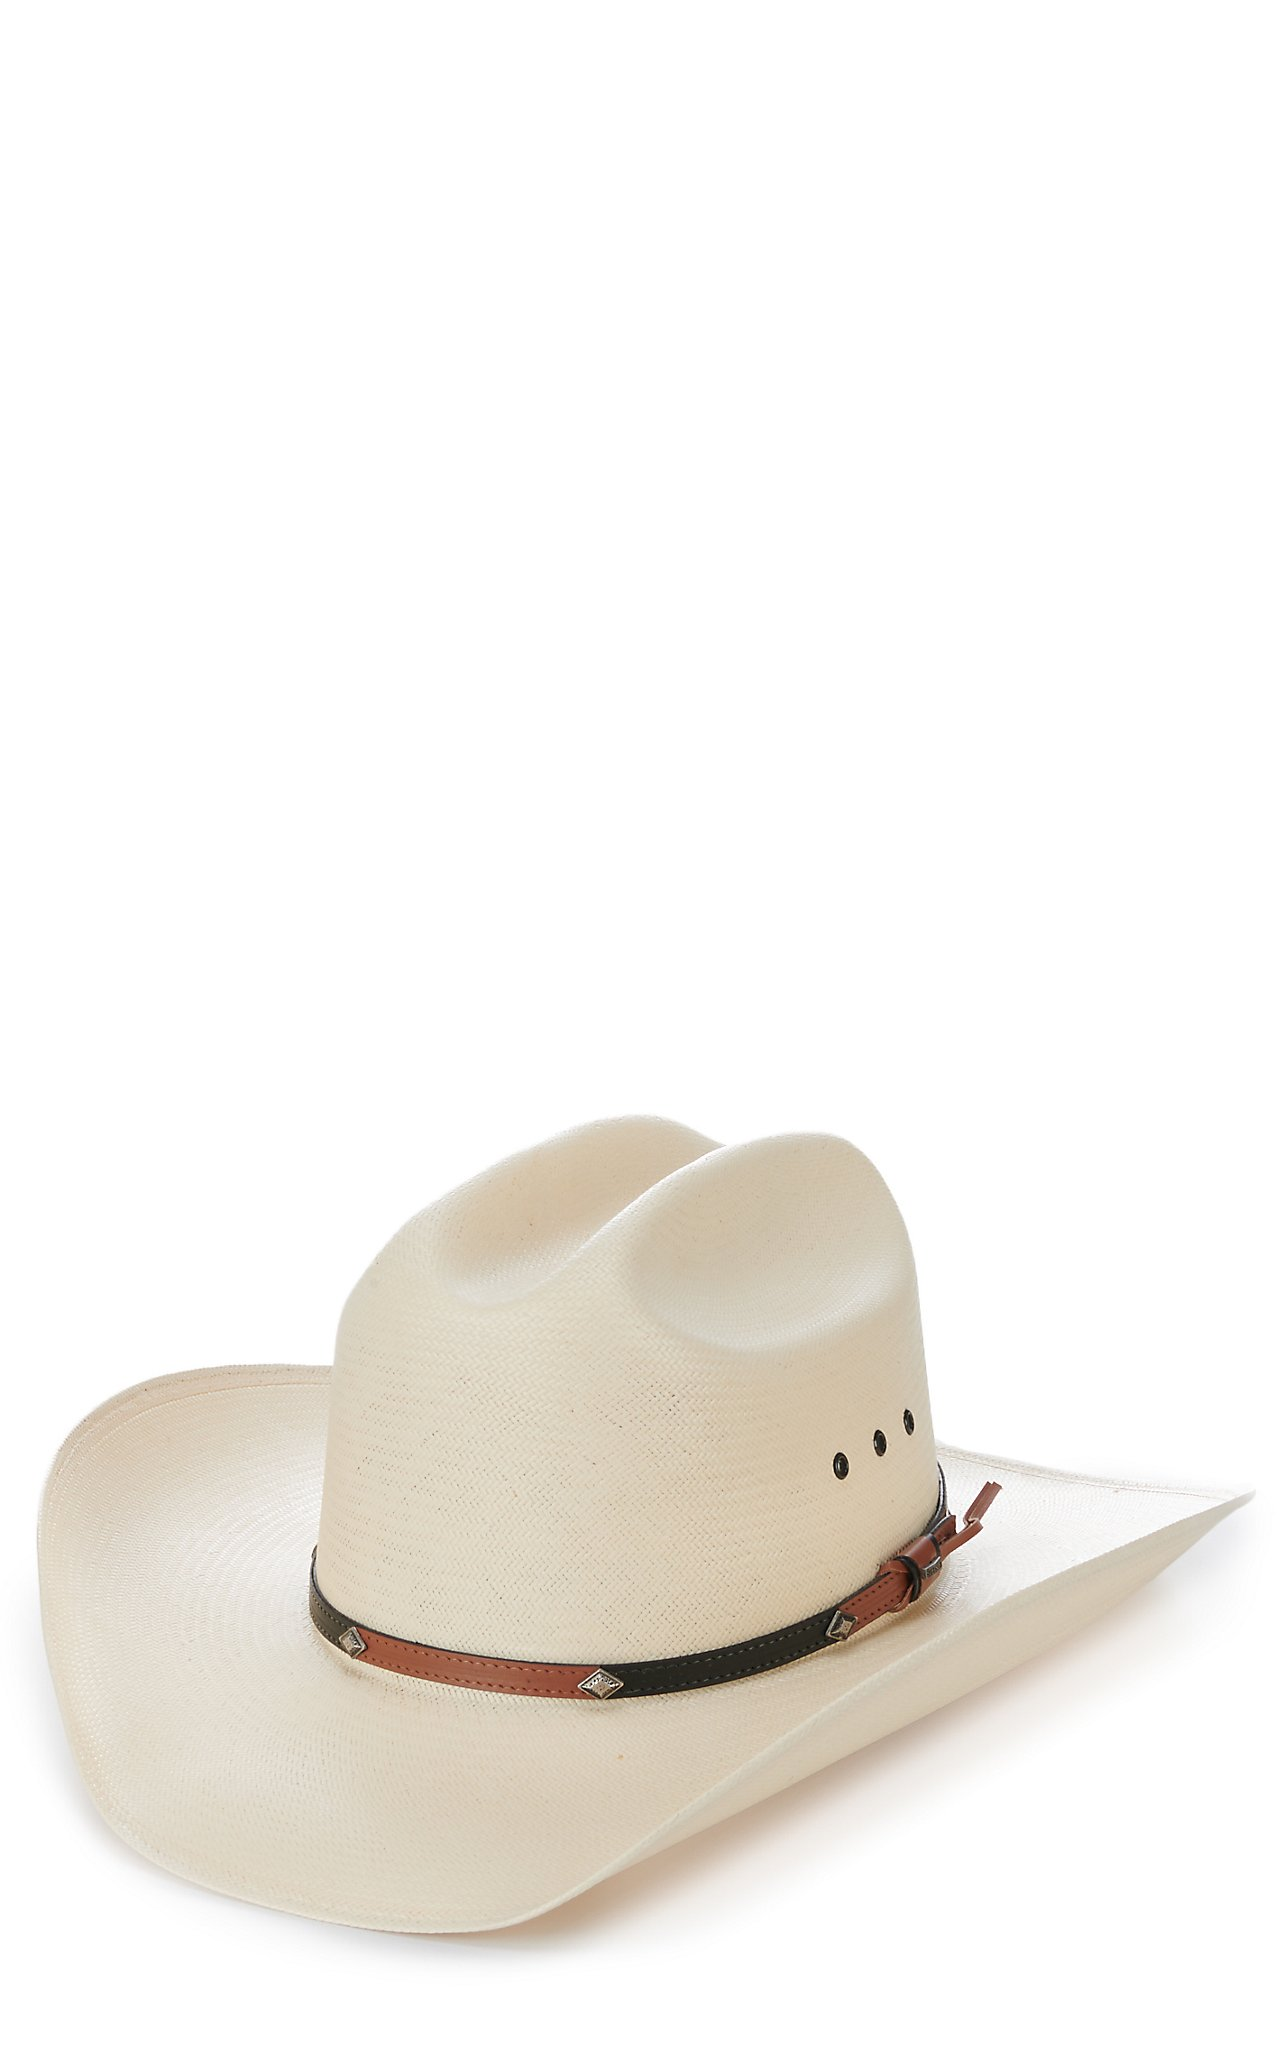 44e39621b6a Stetson 10X Grant Comfort Straw Cowboy Hat